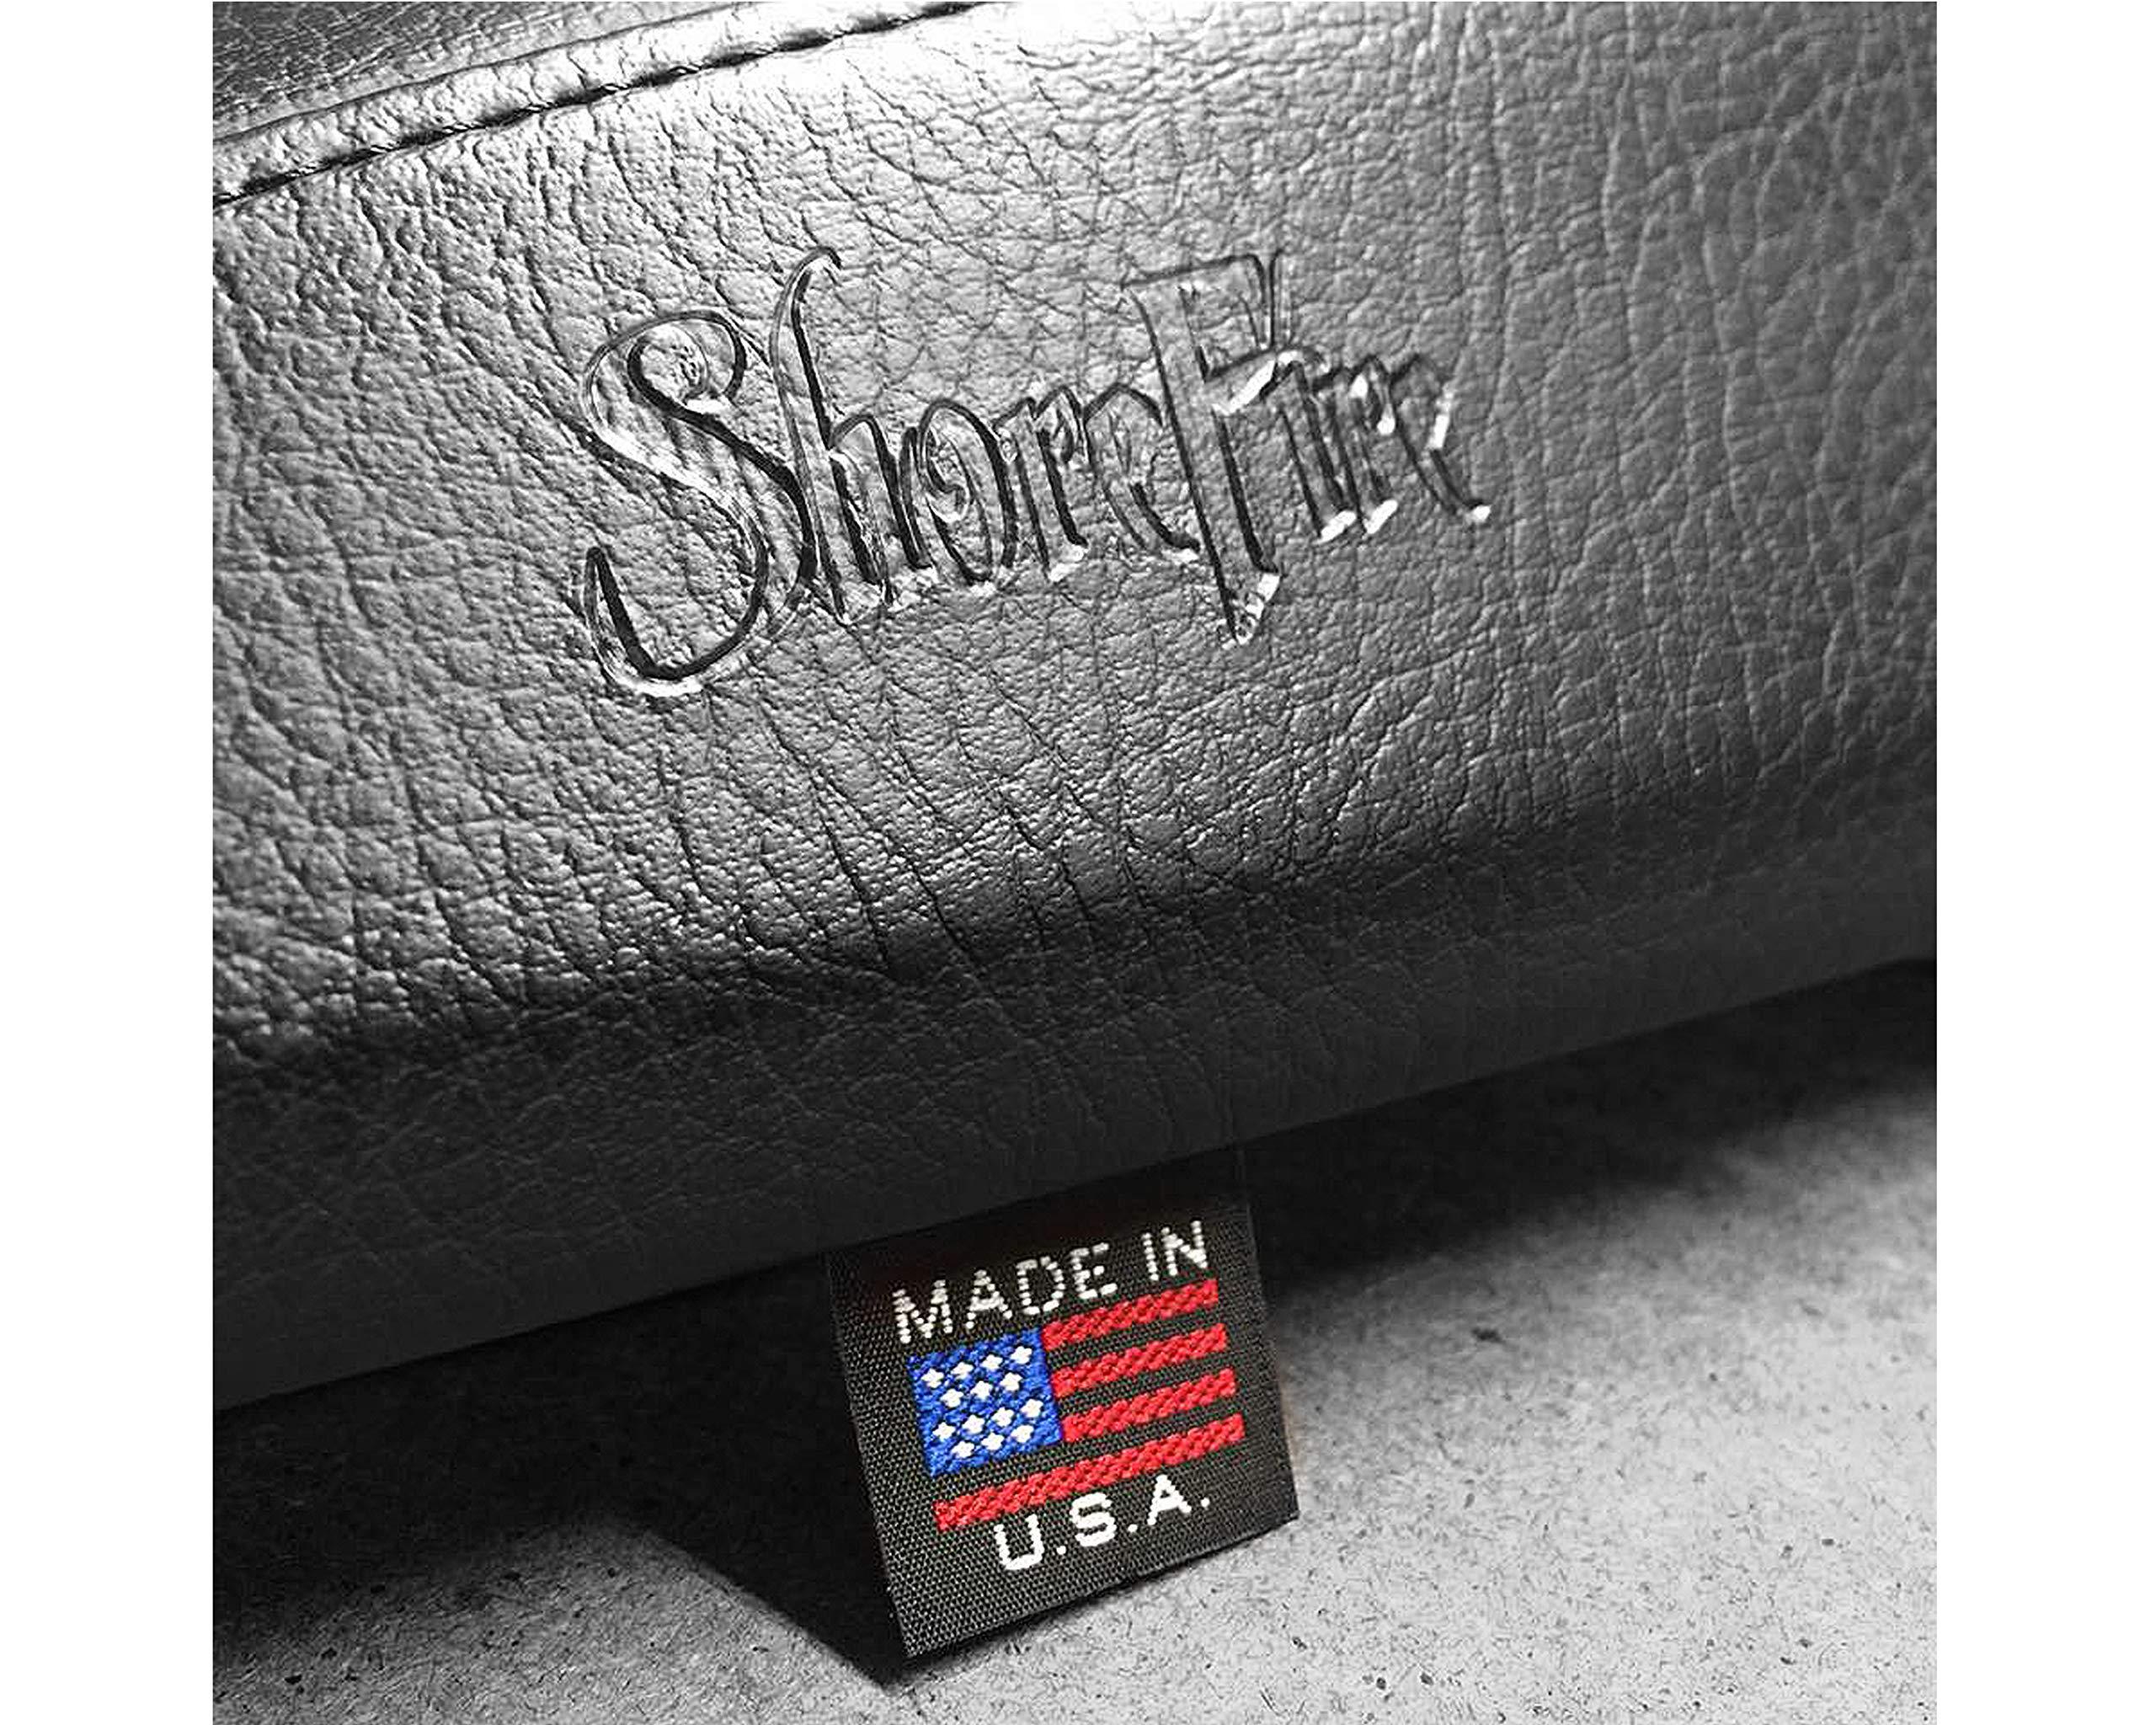 Black Stitch 2014-2019 Premium Saddlebag Lid Covers For Harley Davidson Baggers by ShoreFire Design